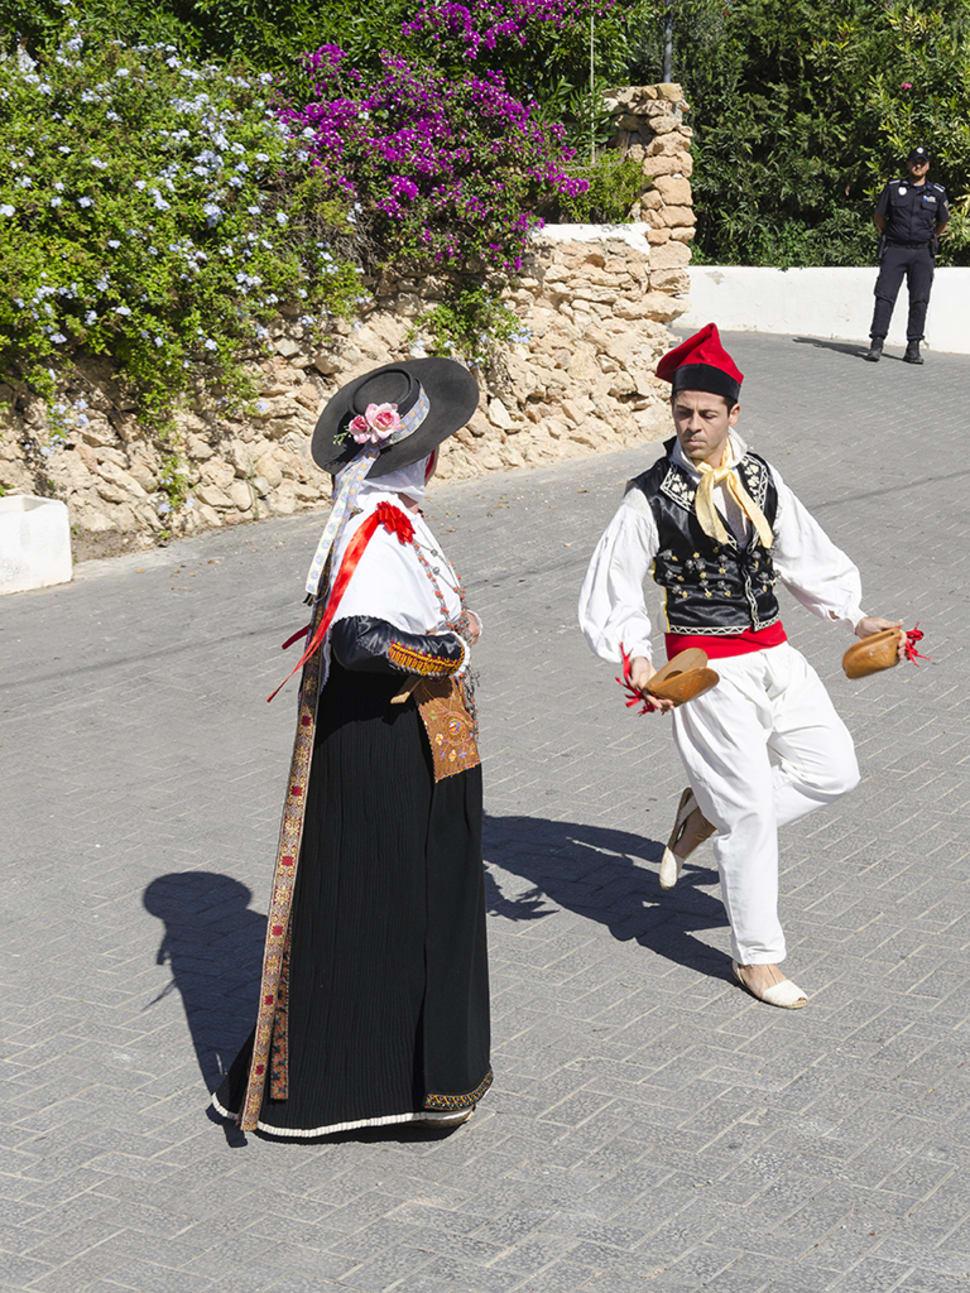 Ball Pagès: Traditional Ibizan Folk Dance in Ibiza - Best Season